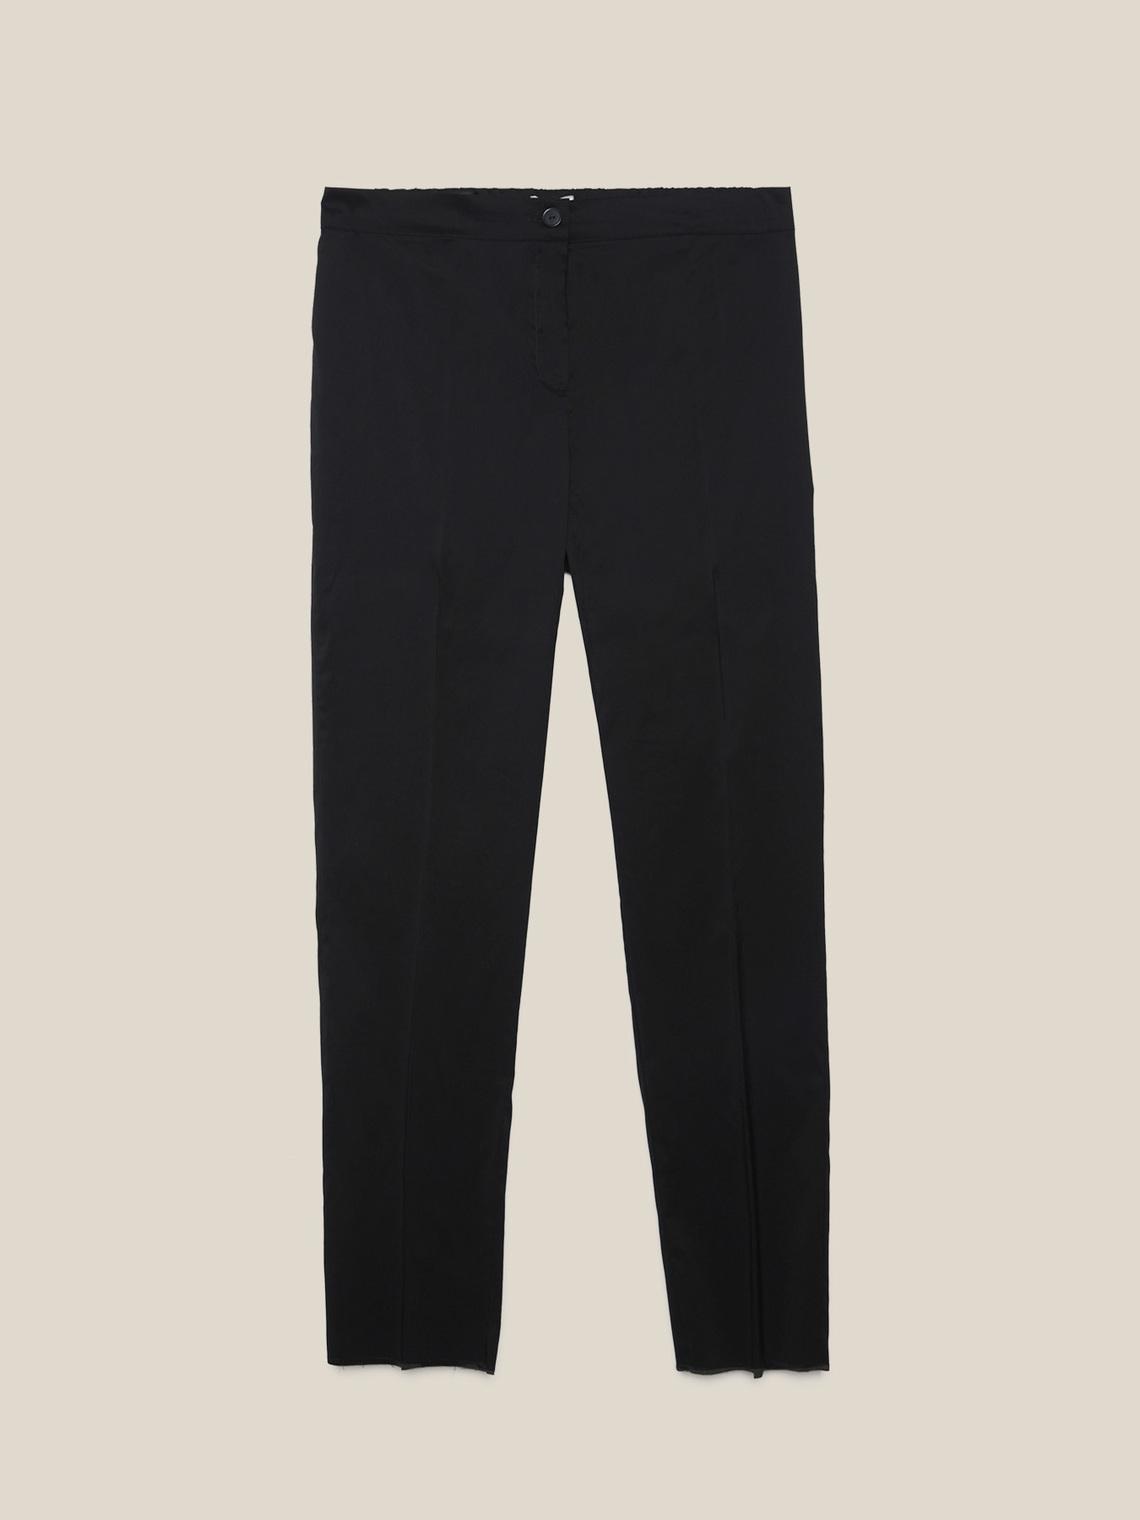 00b2b136ac Pantaloni in cotone stretch - Elena Mirò - ES